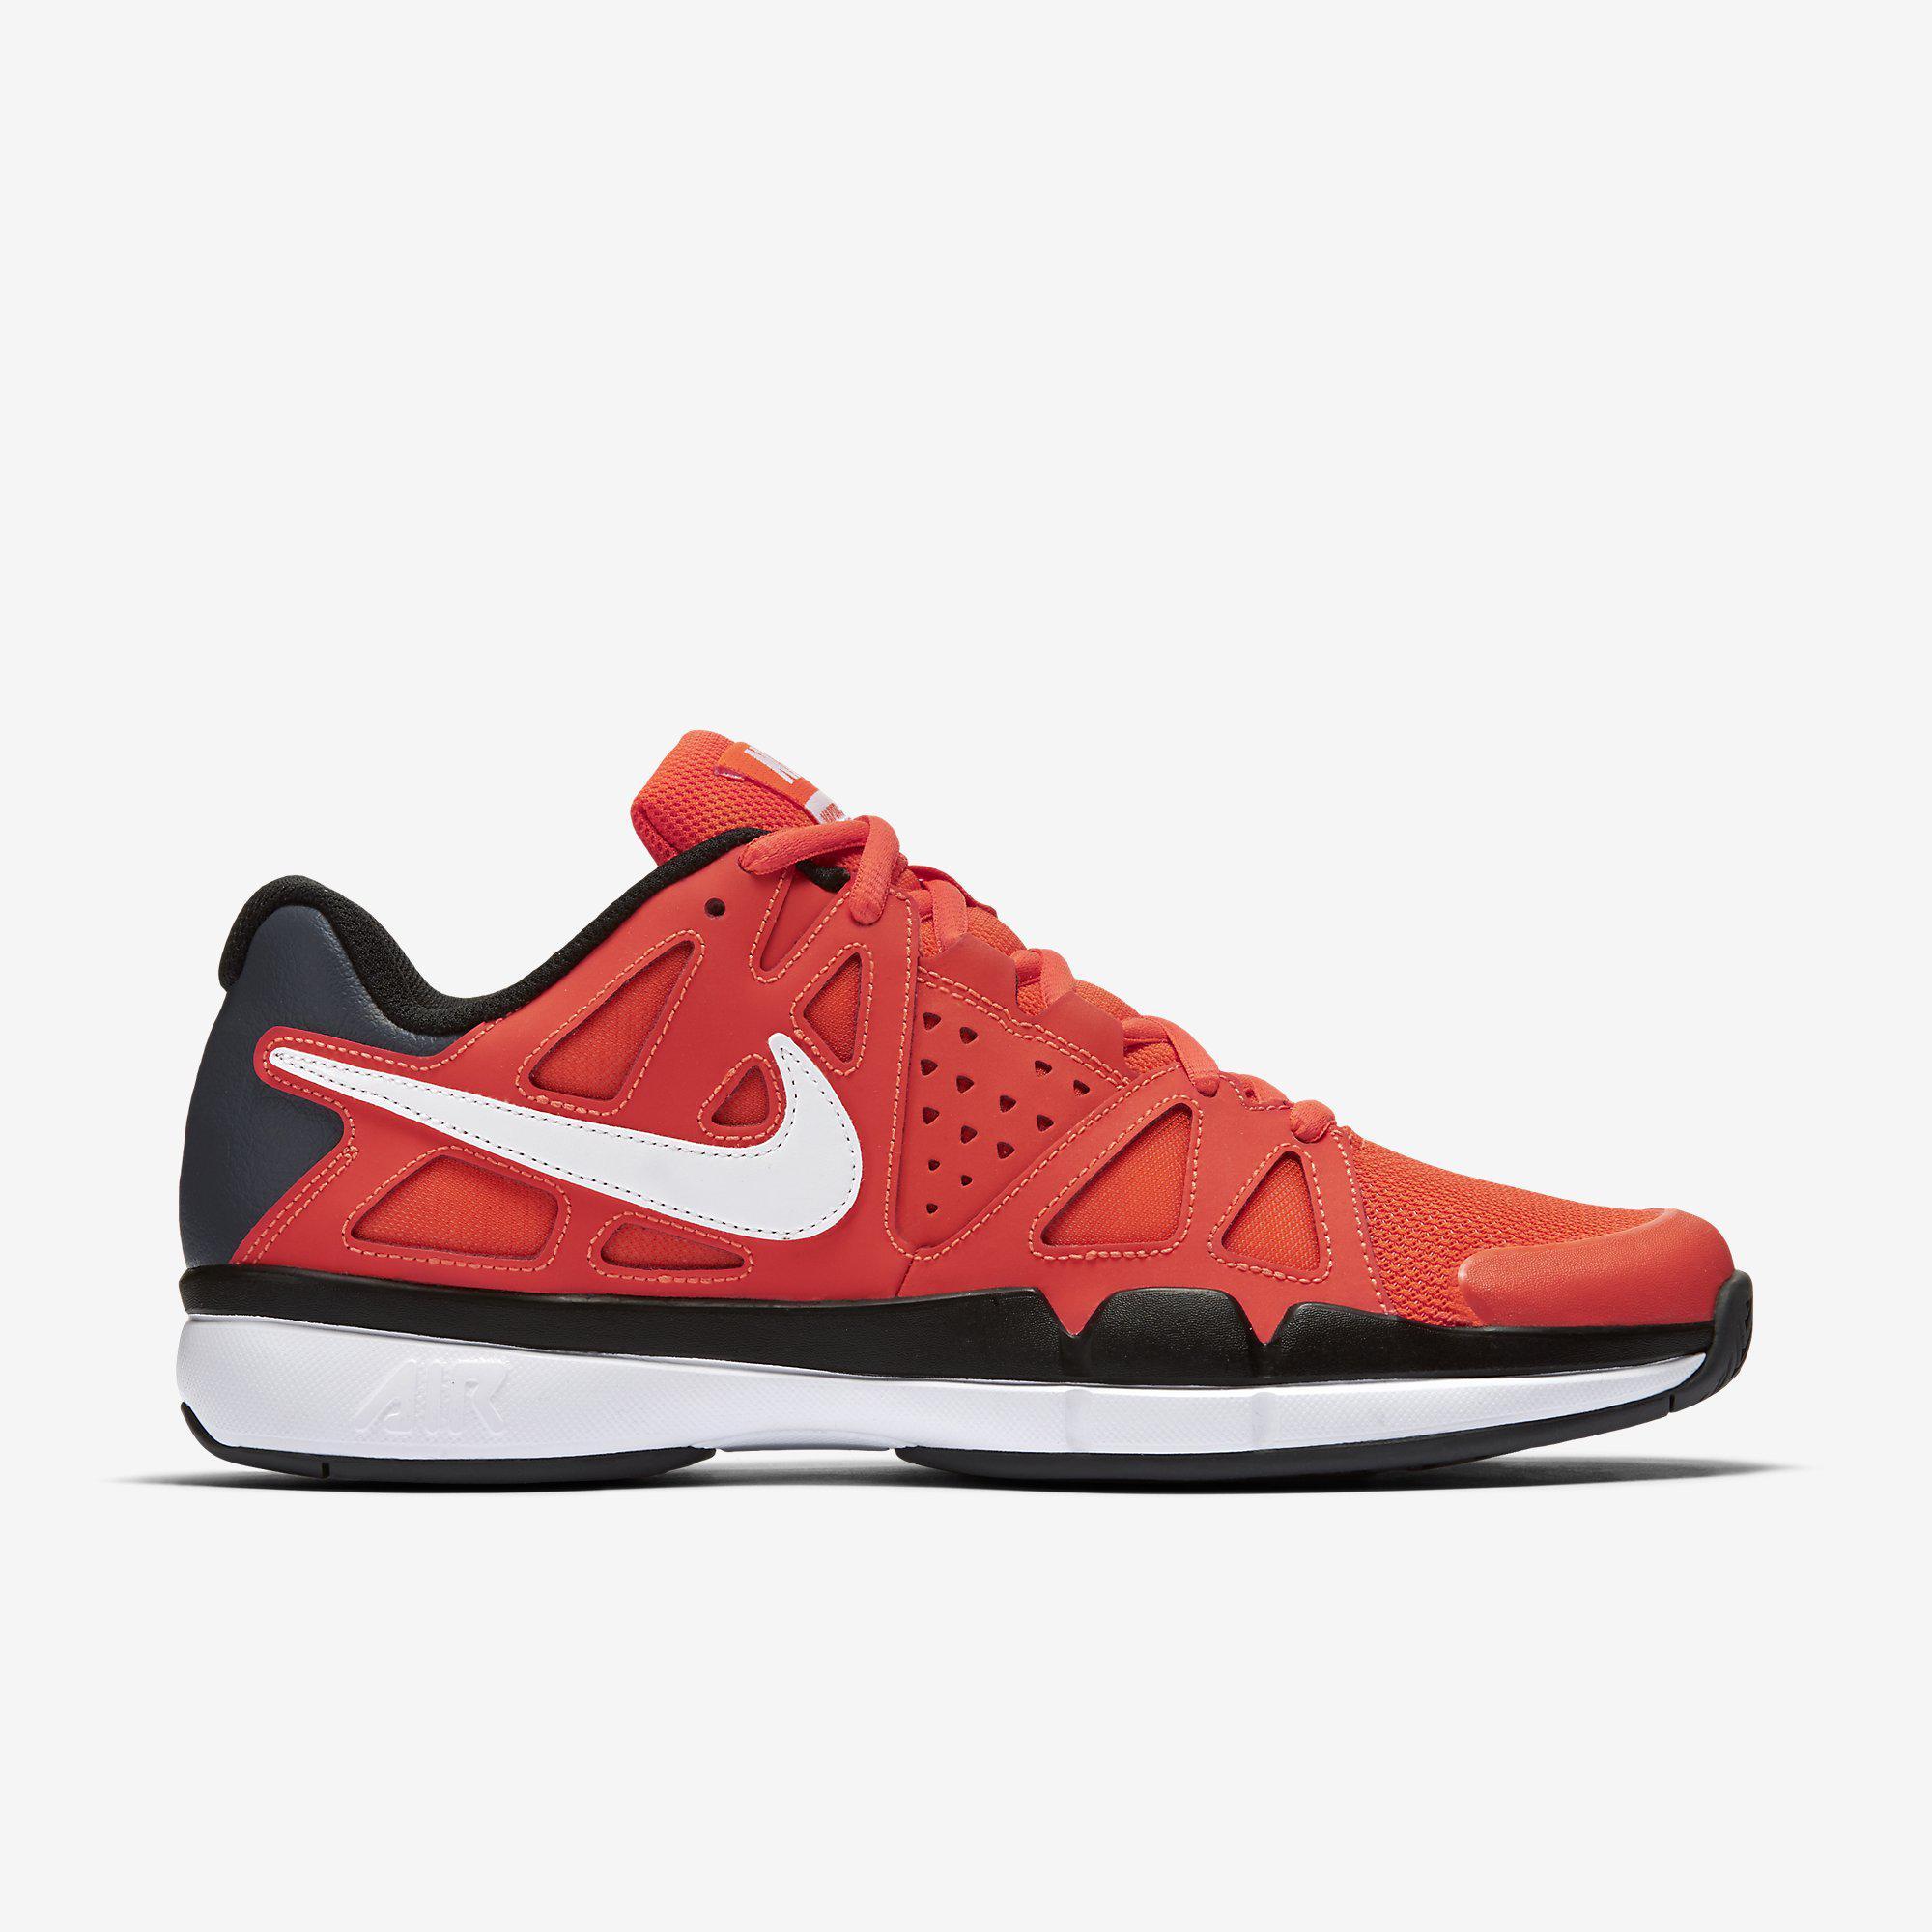 247ae6424225 Nike Mens Air Vapor Advantage Tennis Shoes - Orange Black - Tennisnuts.com